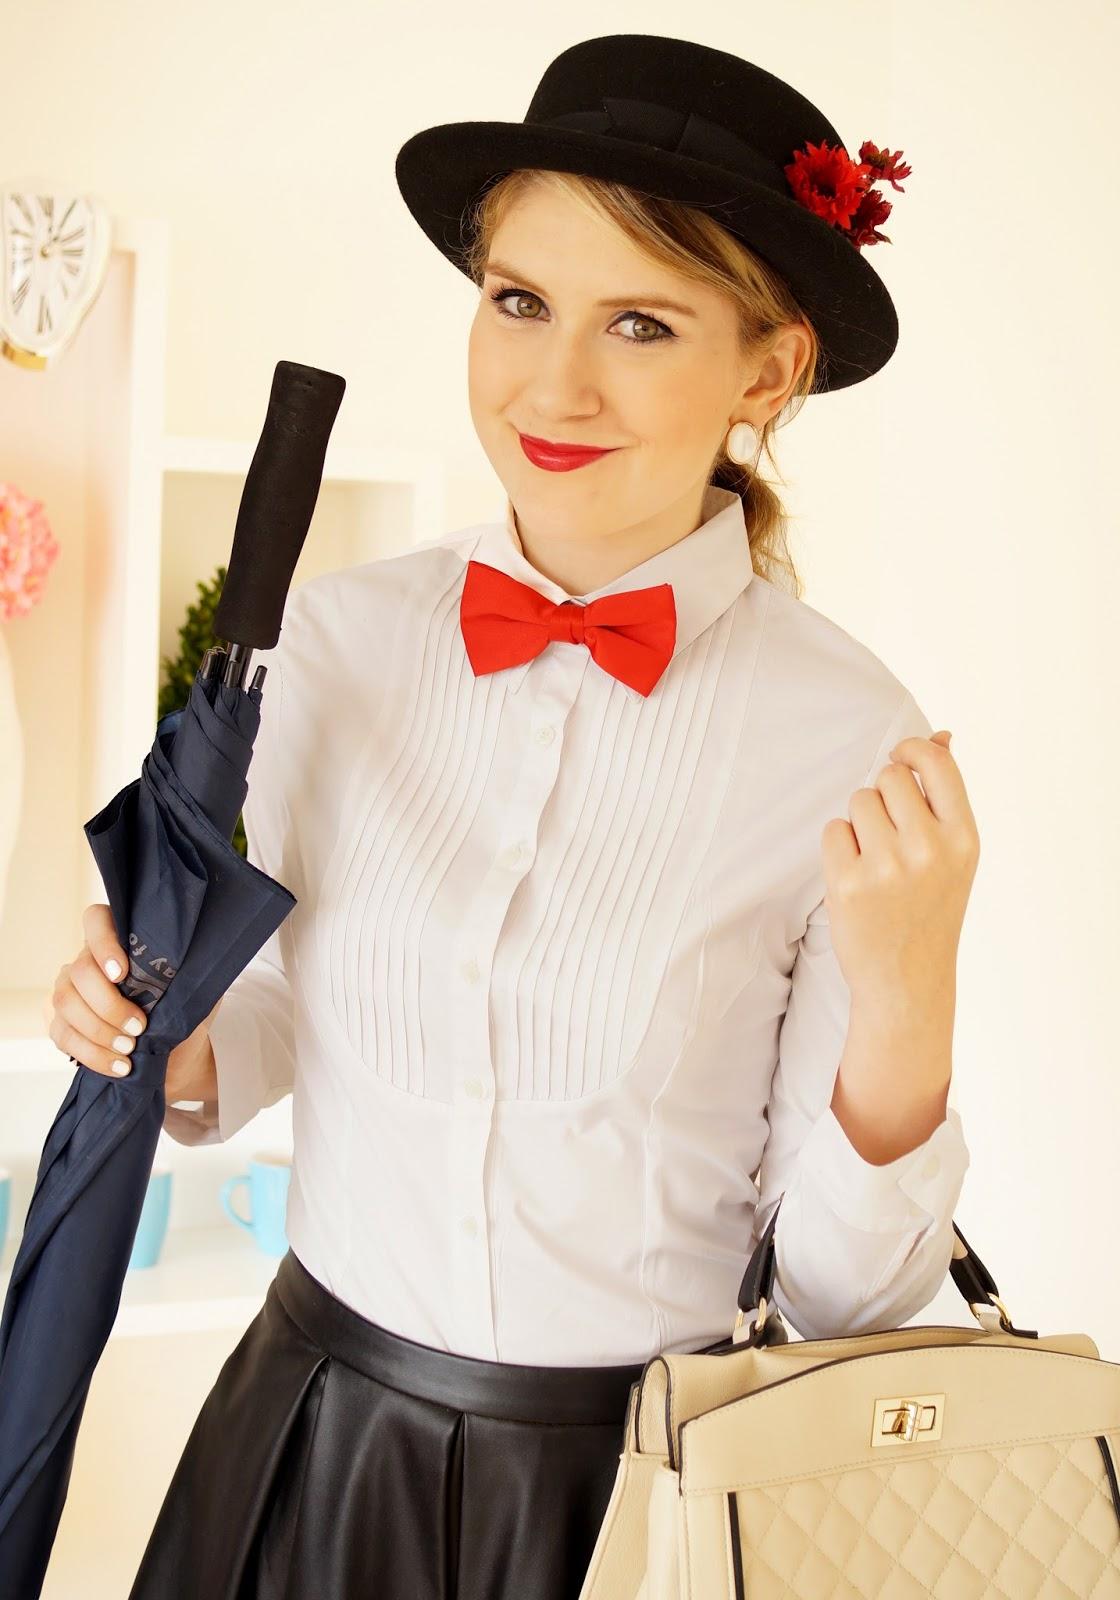 Last Minute Mary Poppins Halloween Costume